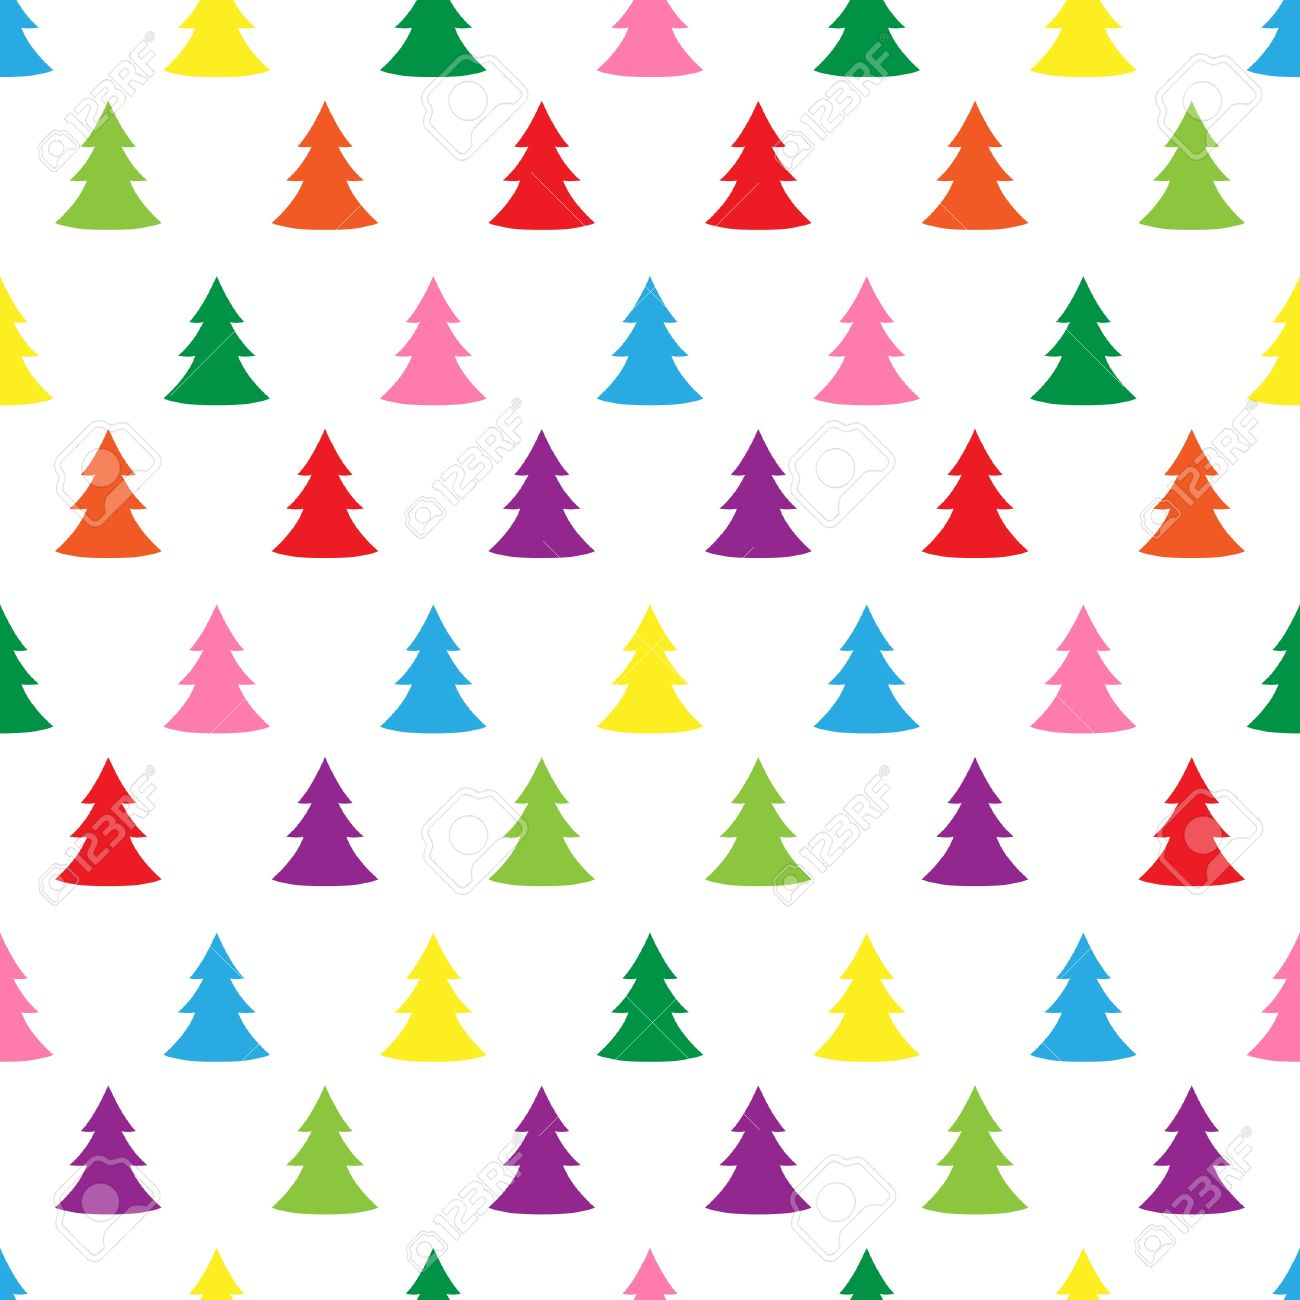 Christmas Tree Pattern.Seamless Simple Cute Christmas Tree Illustration Pattern